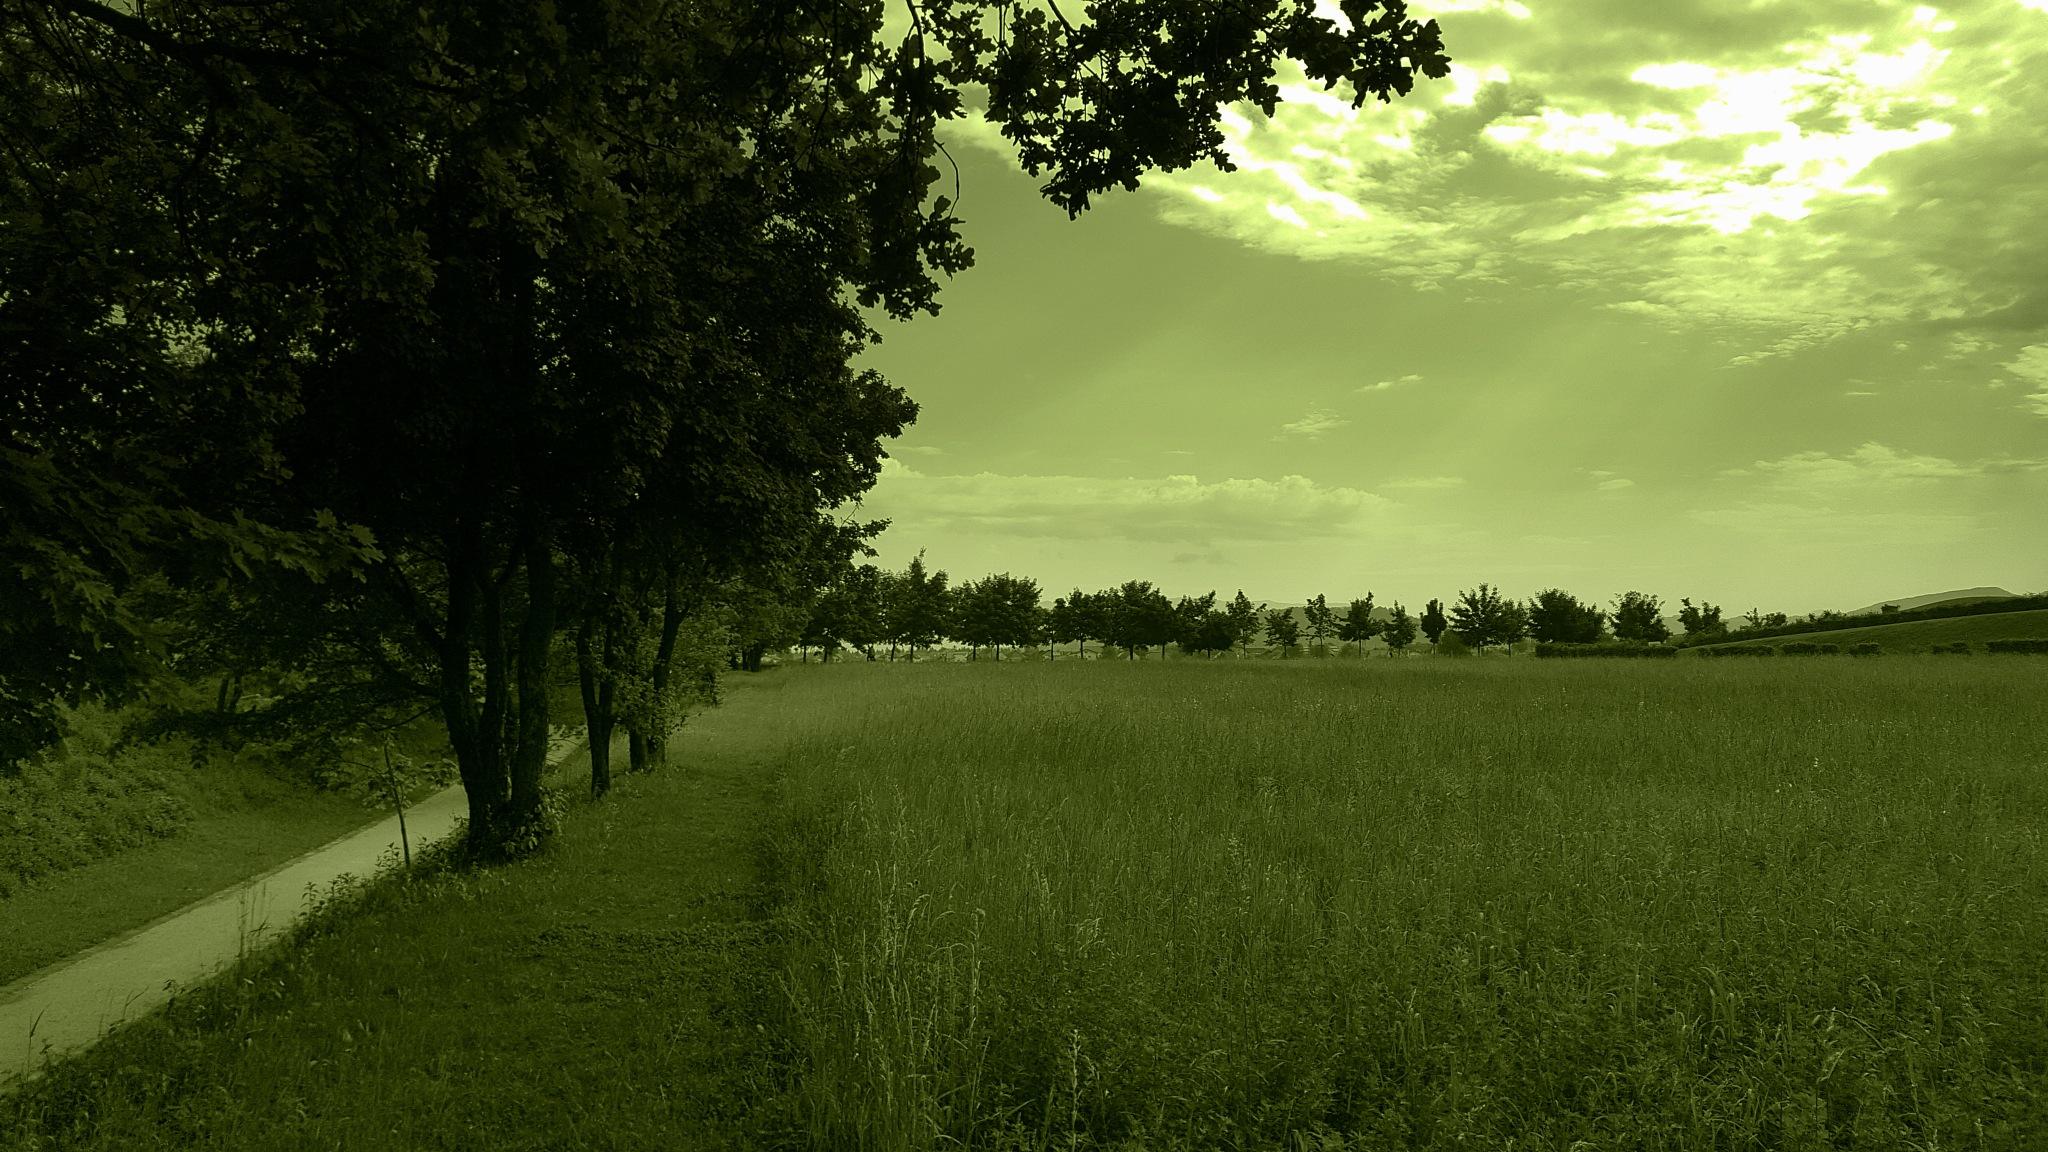 field - polje by zvnktomasevic